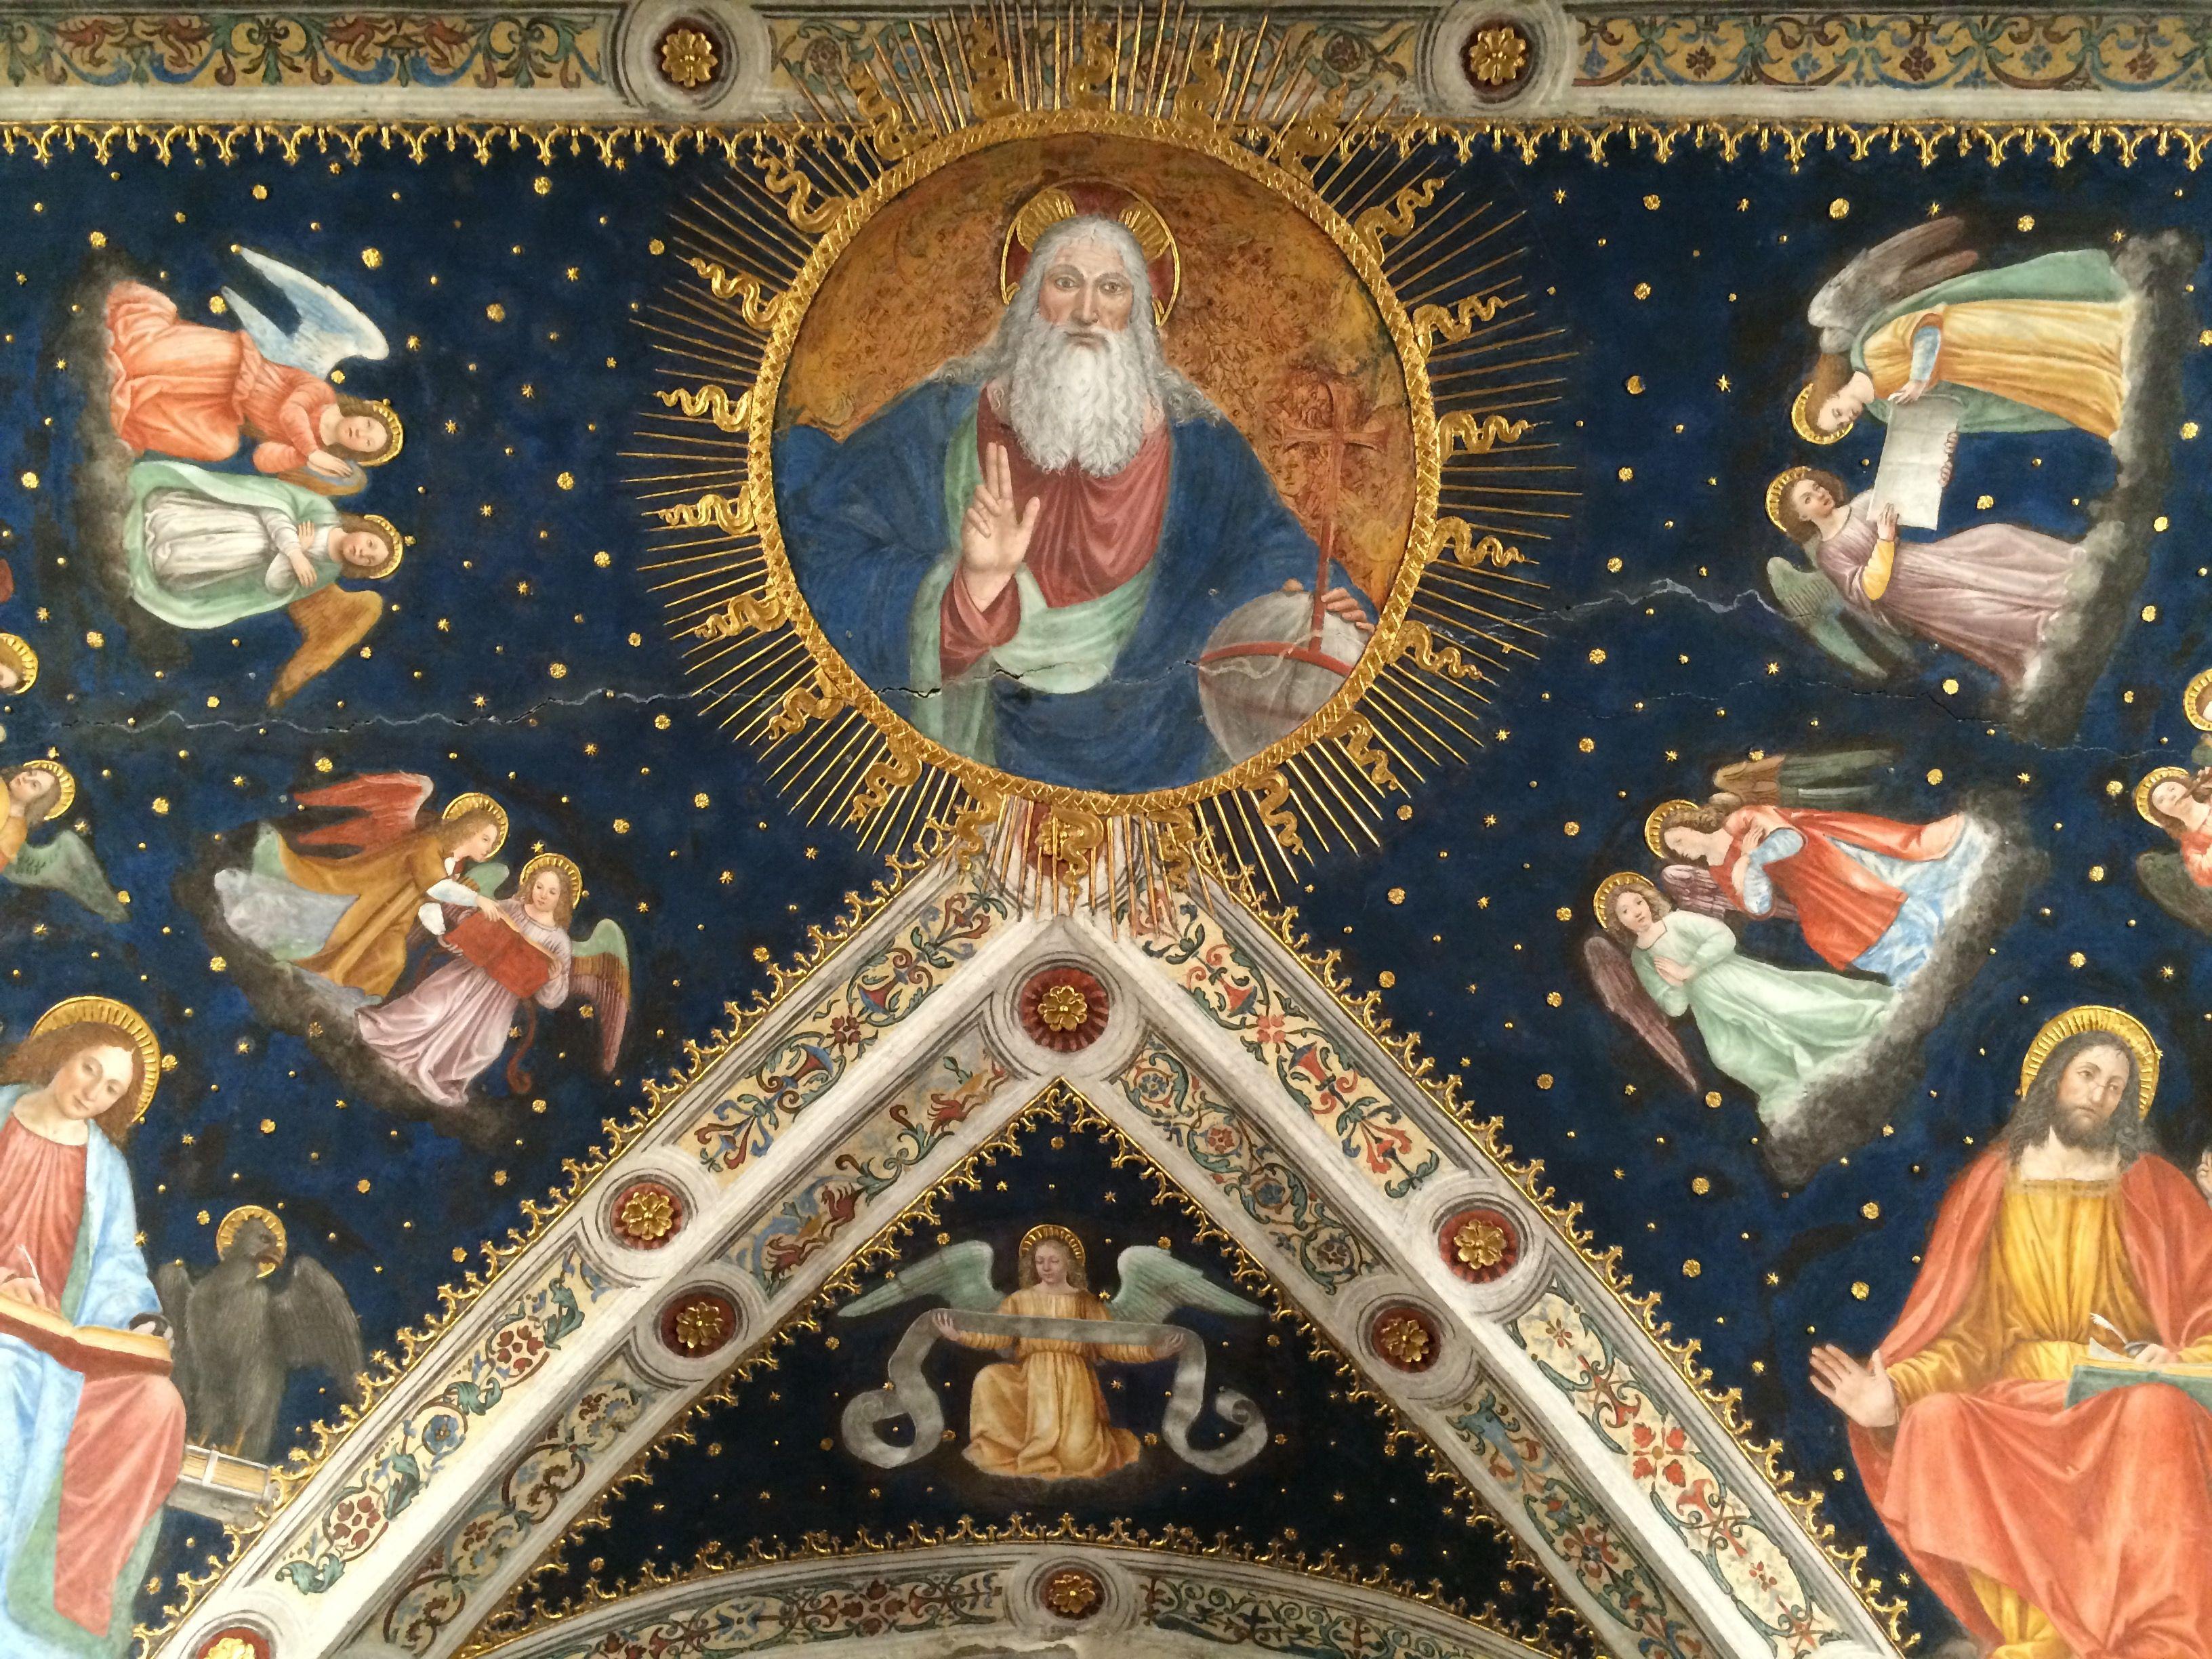 Veneranda Biblioteca Ambrosiana - Milão